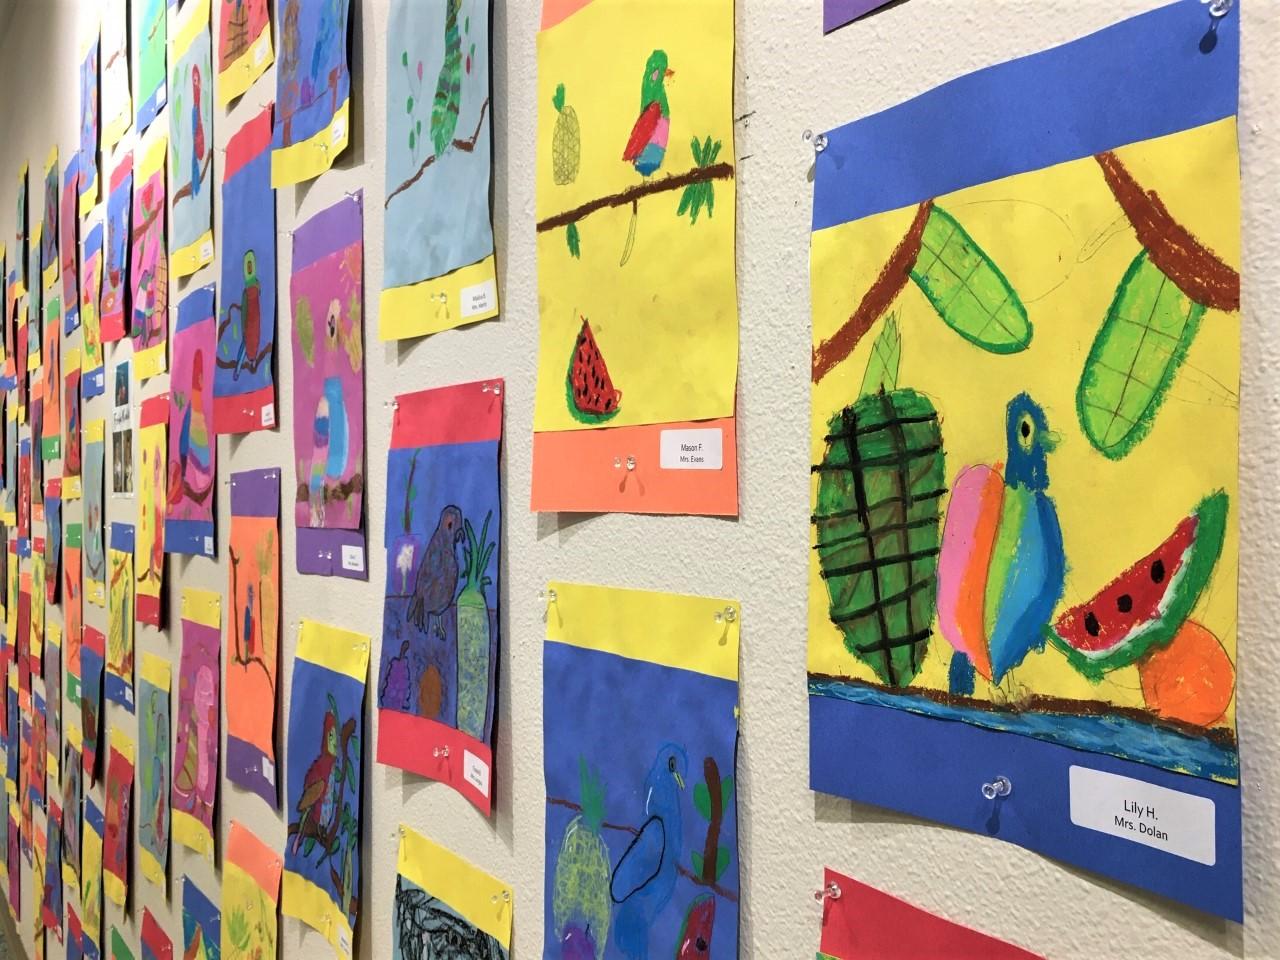 Art Reception for Student Artists of Melton Elementary School